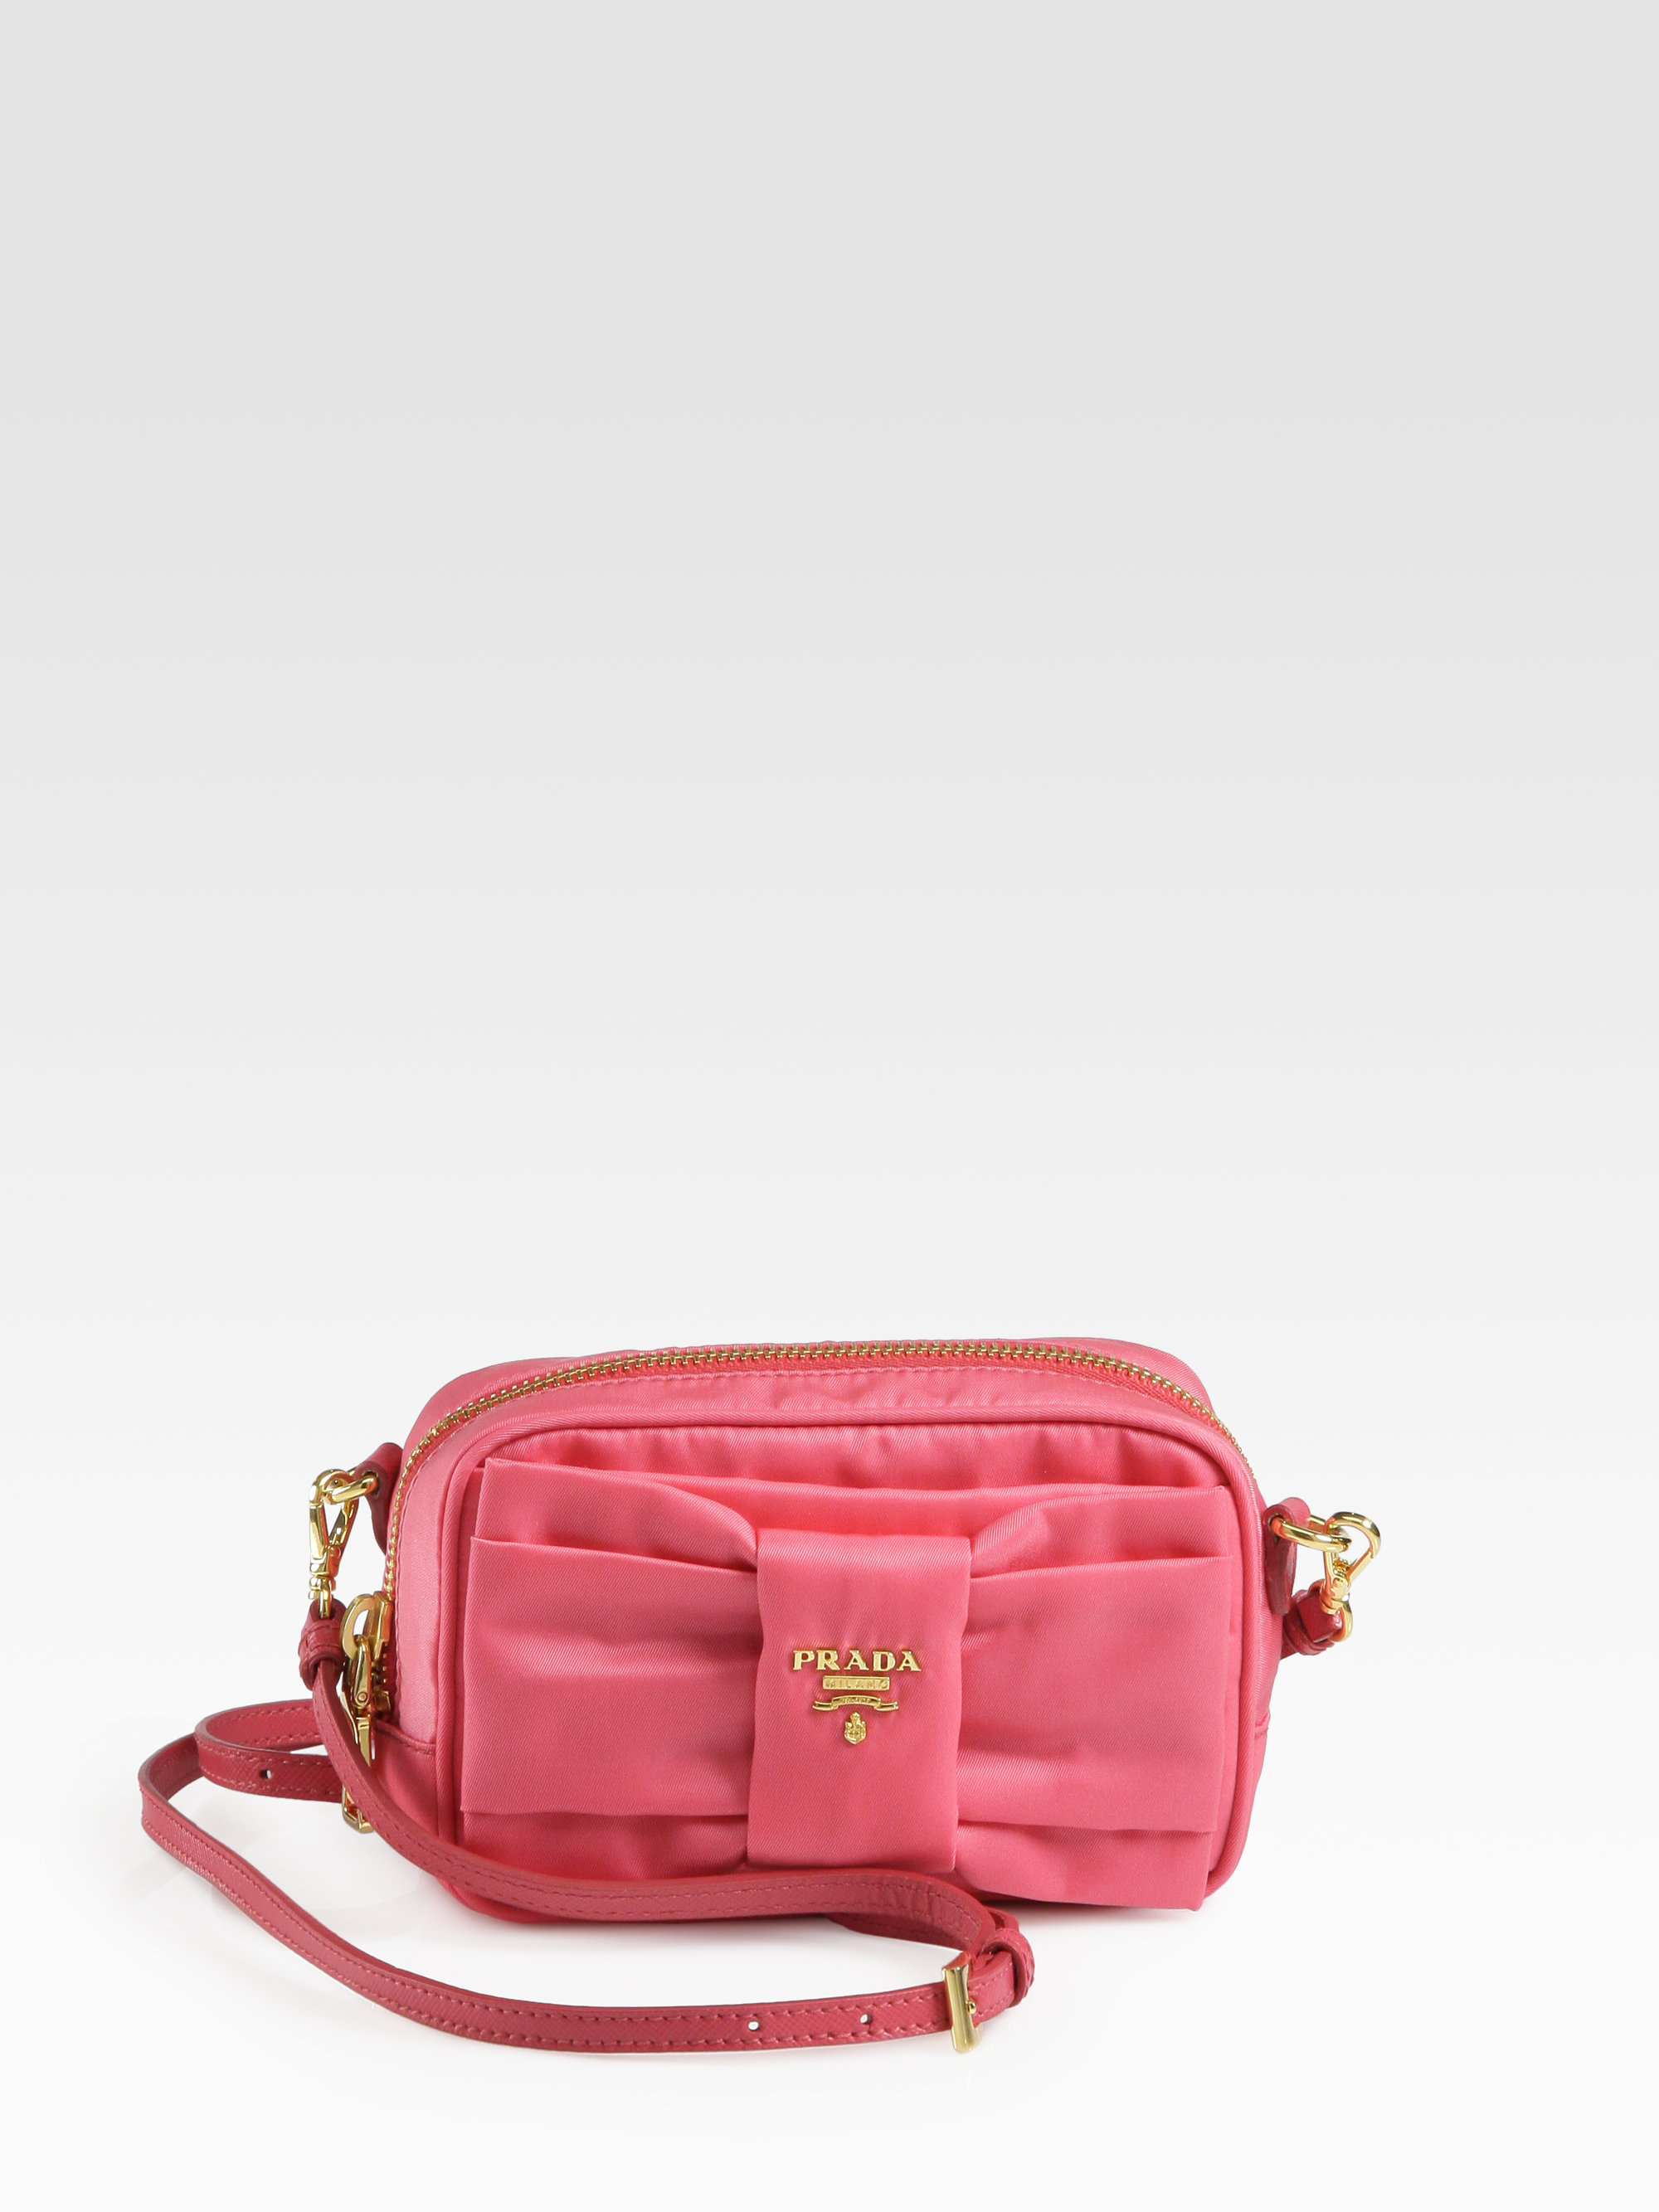 authentic prada handbags for less - Prada Tessuto Nylon Bow Crossbody Bag in Pink (peonia-pink) | Lyst